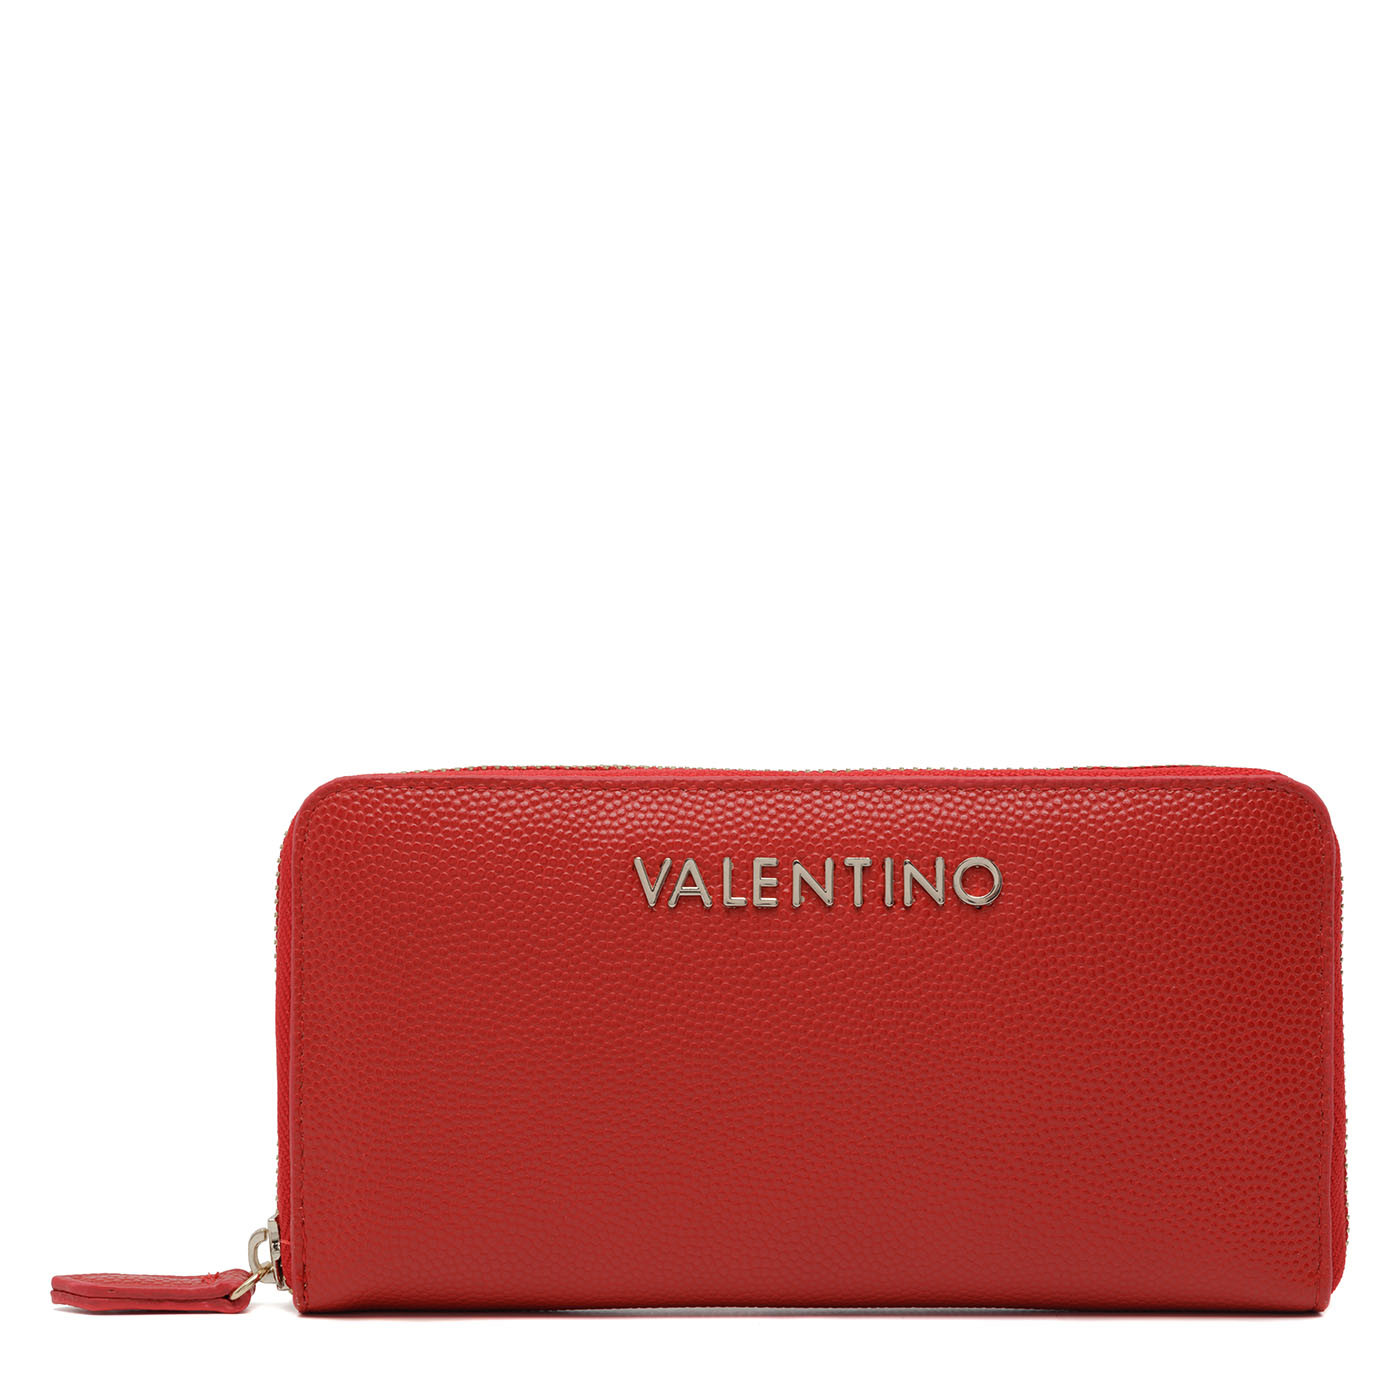 Valentino Divina Ritsportemonnee VPS1R4155GROSSO